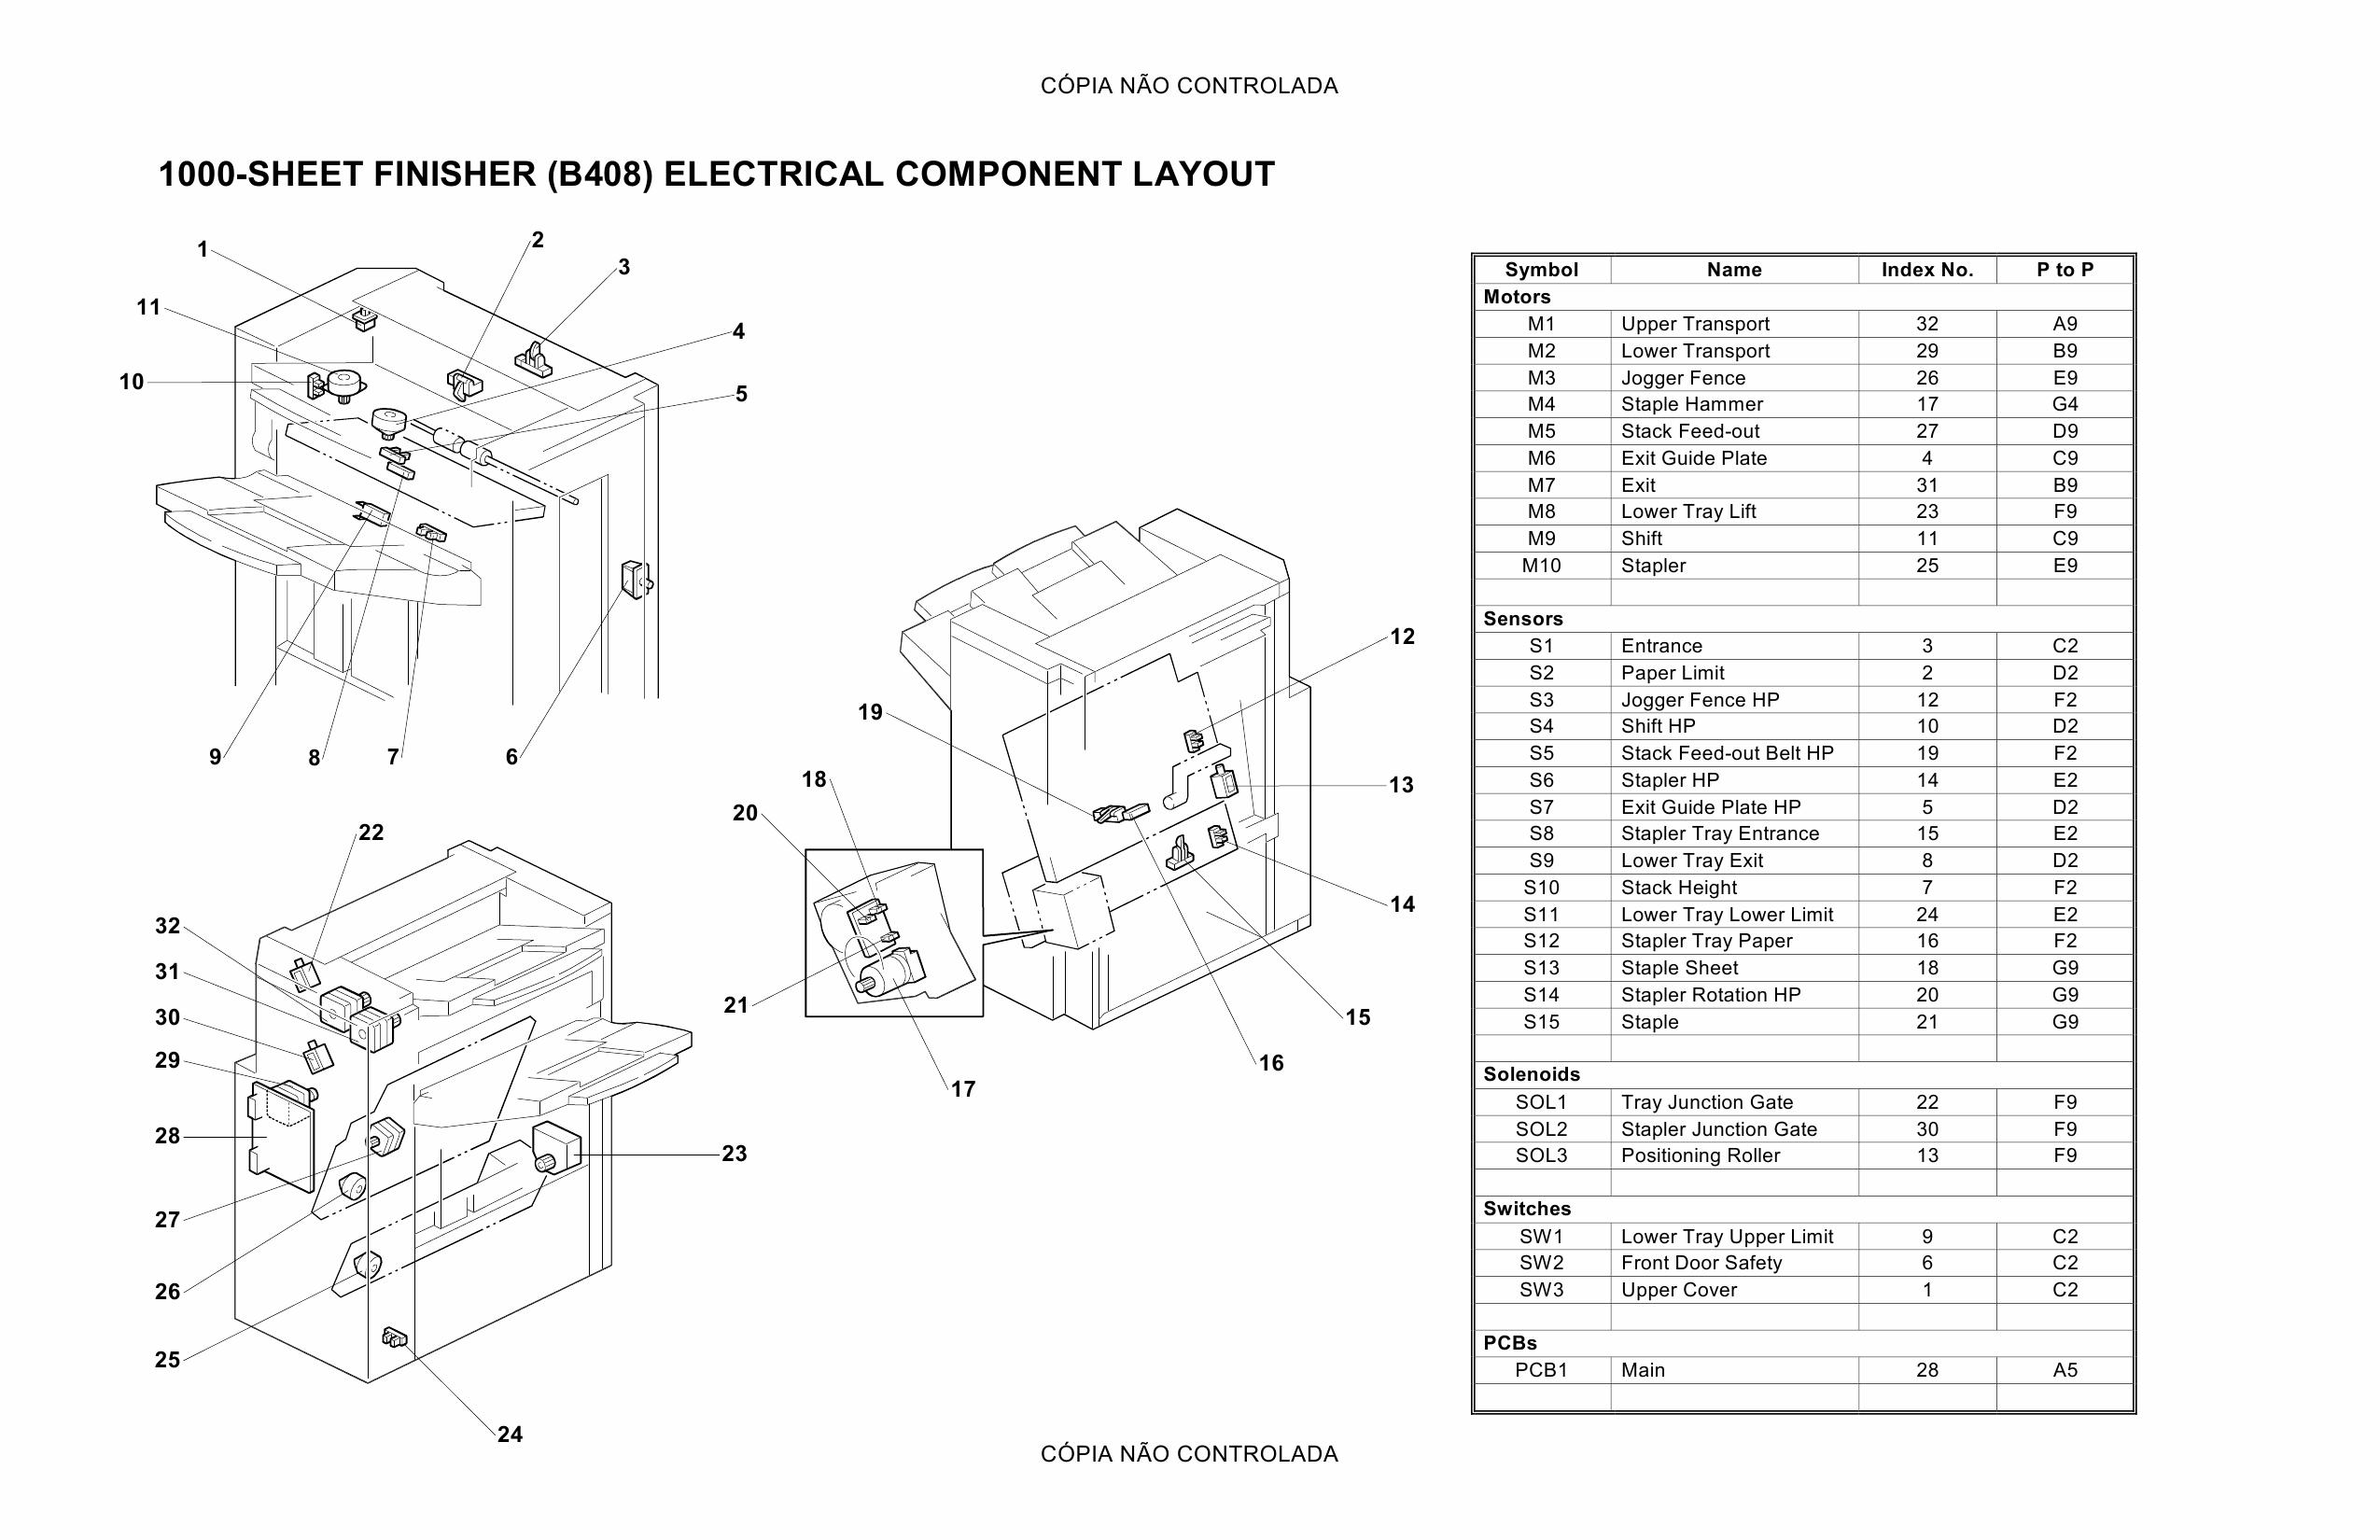 ricoh aficio mp 3500g aficio mp 4500g aficio mp 3500 aficio mp 4500 service repair manual parts catalog